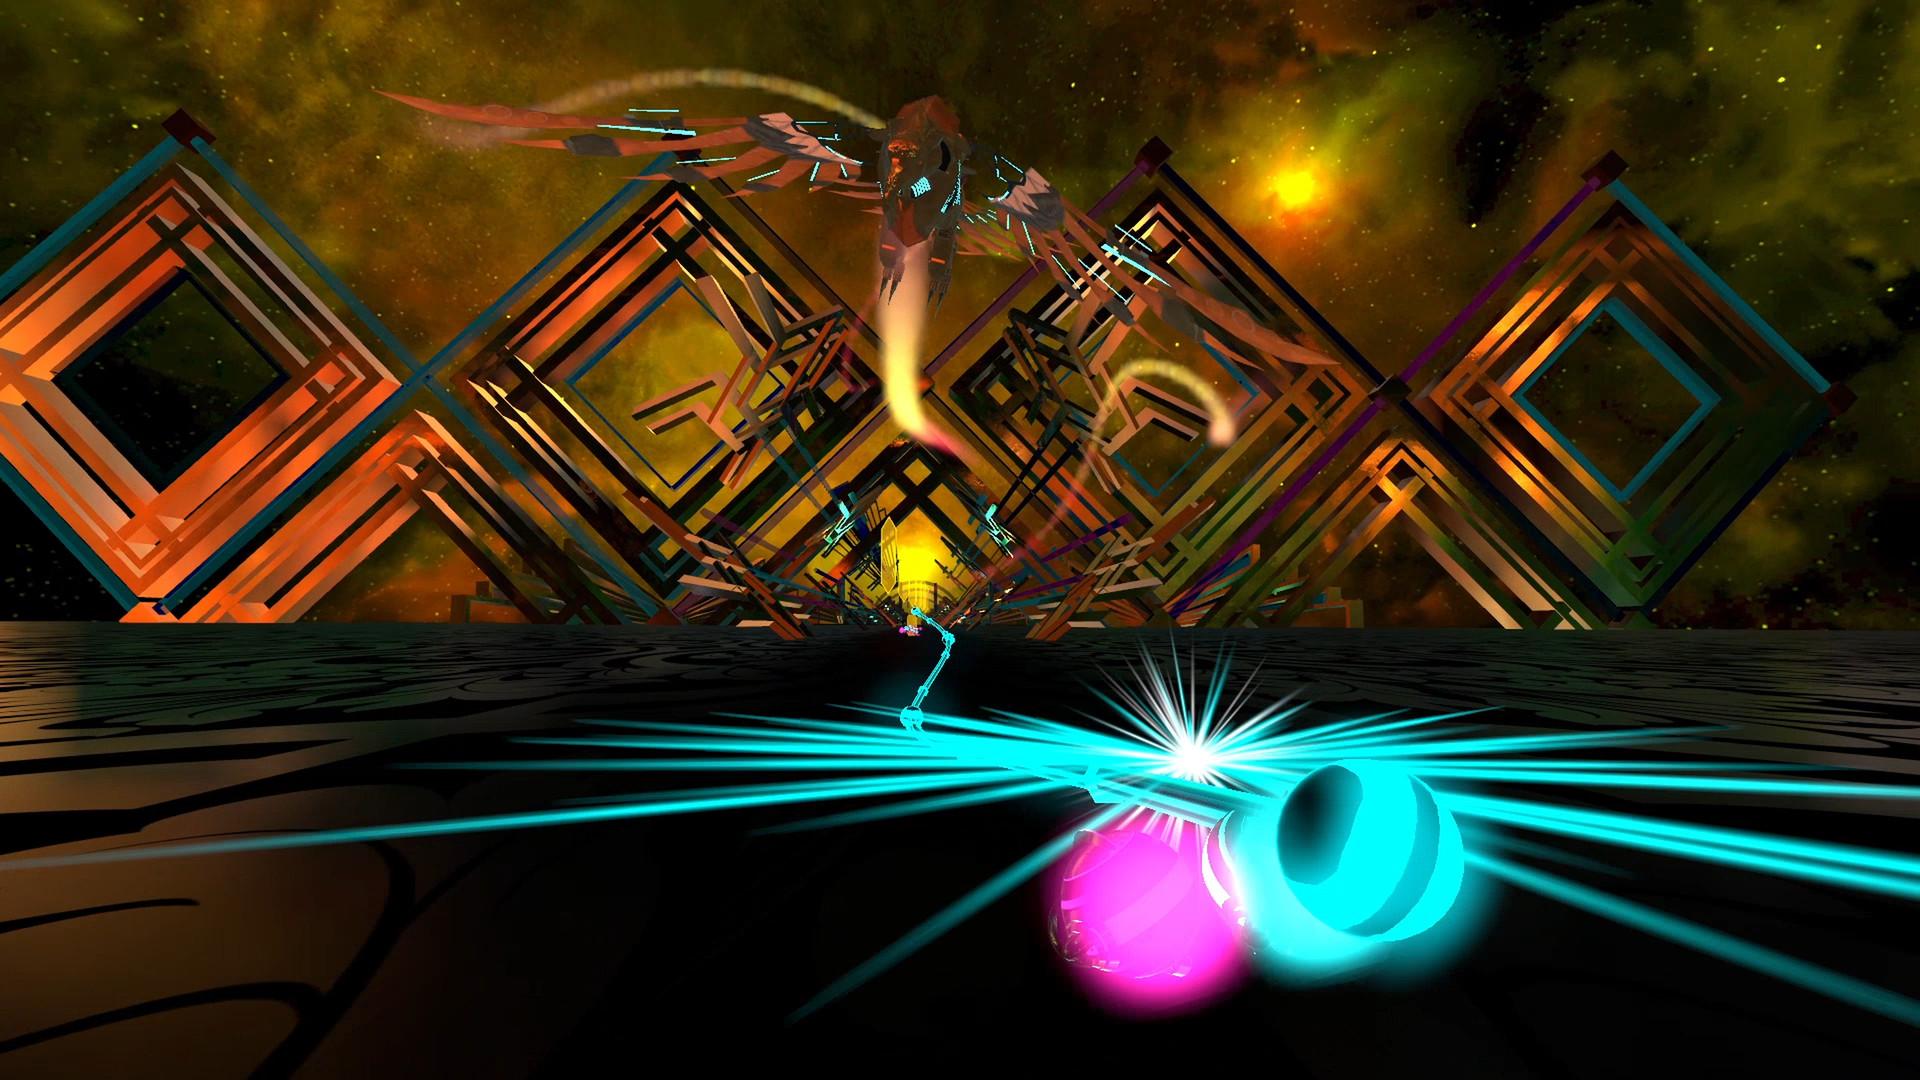 Oculus Quest 游戏《Synth Riders》合成骑士插图(3)